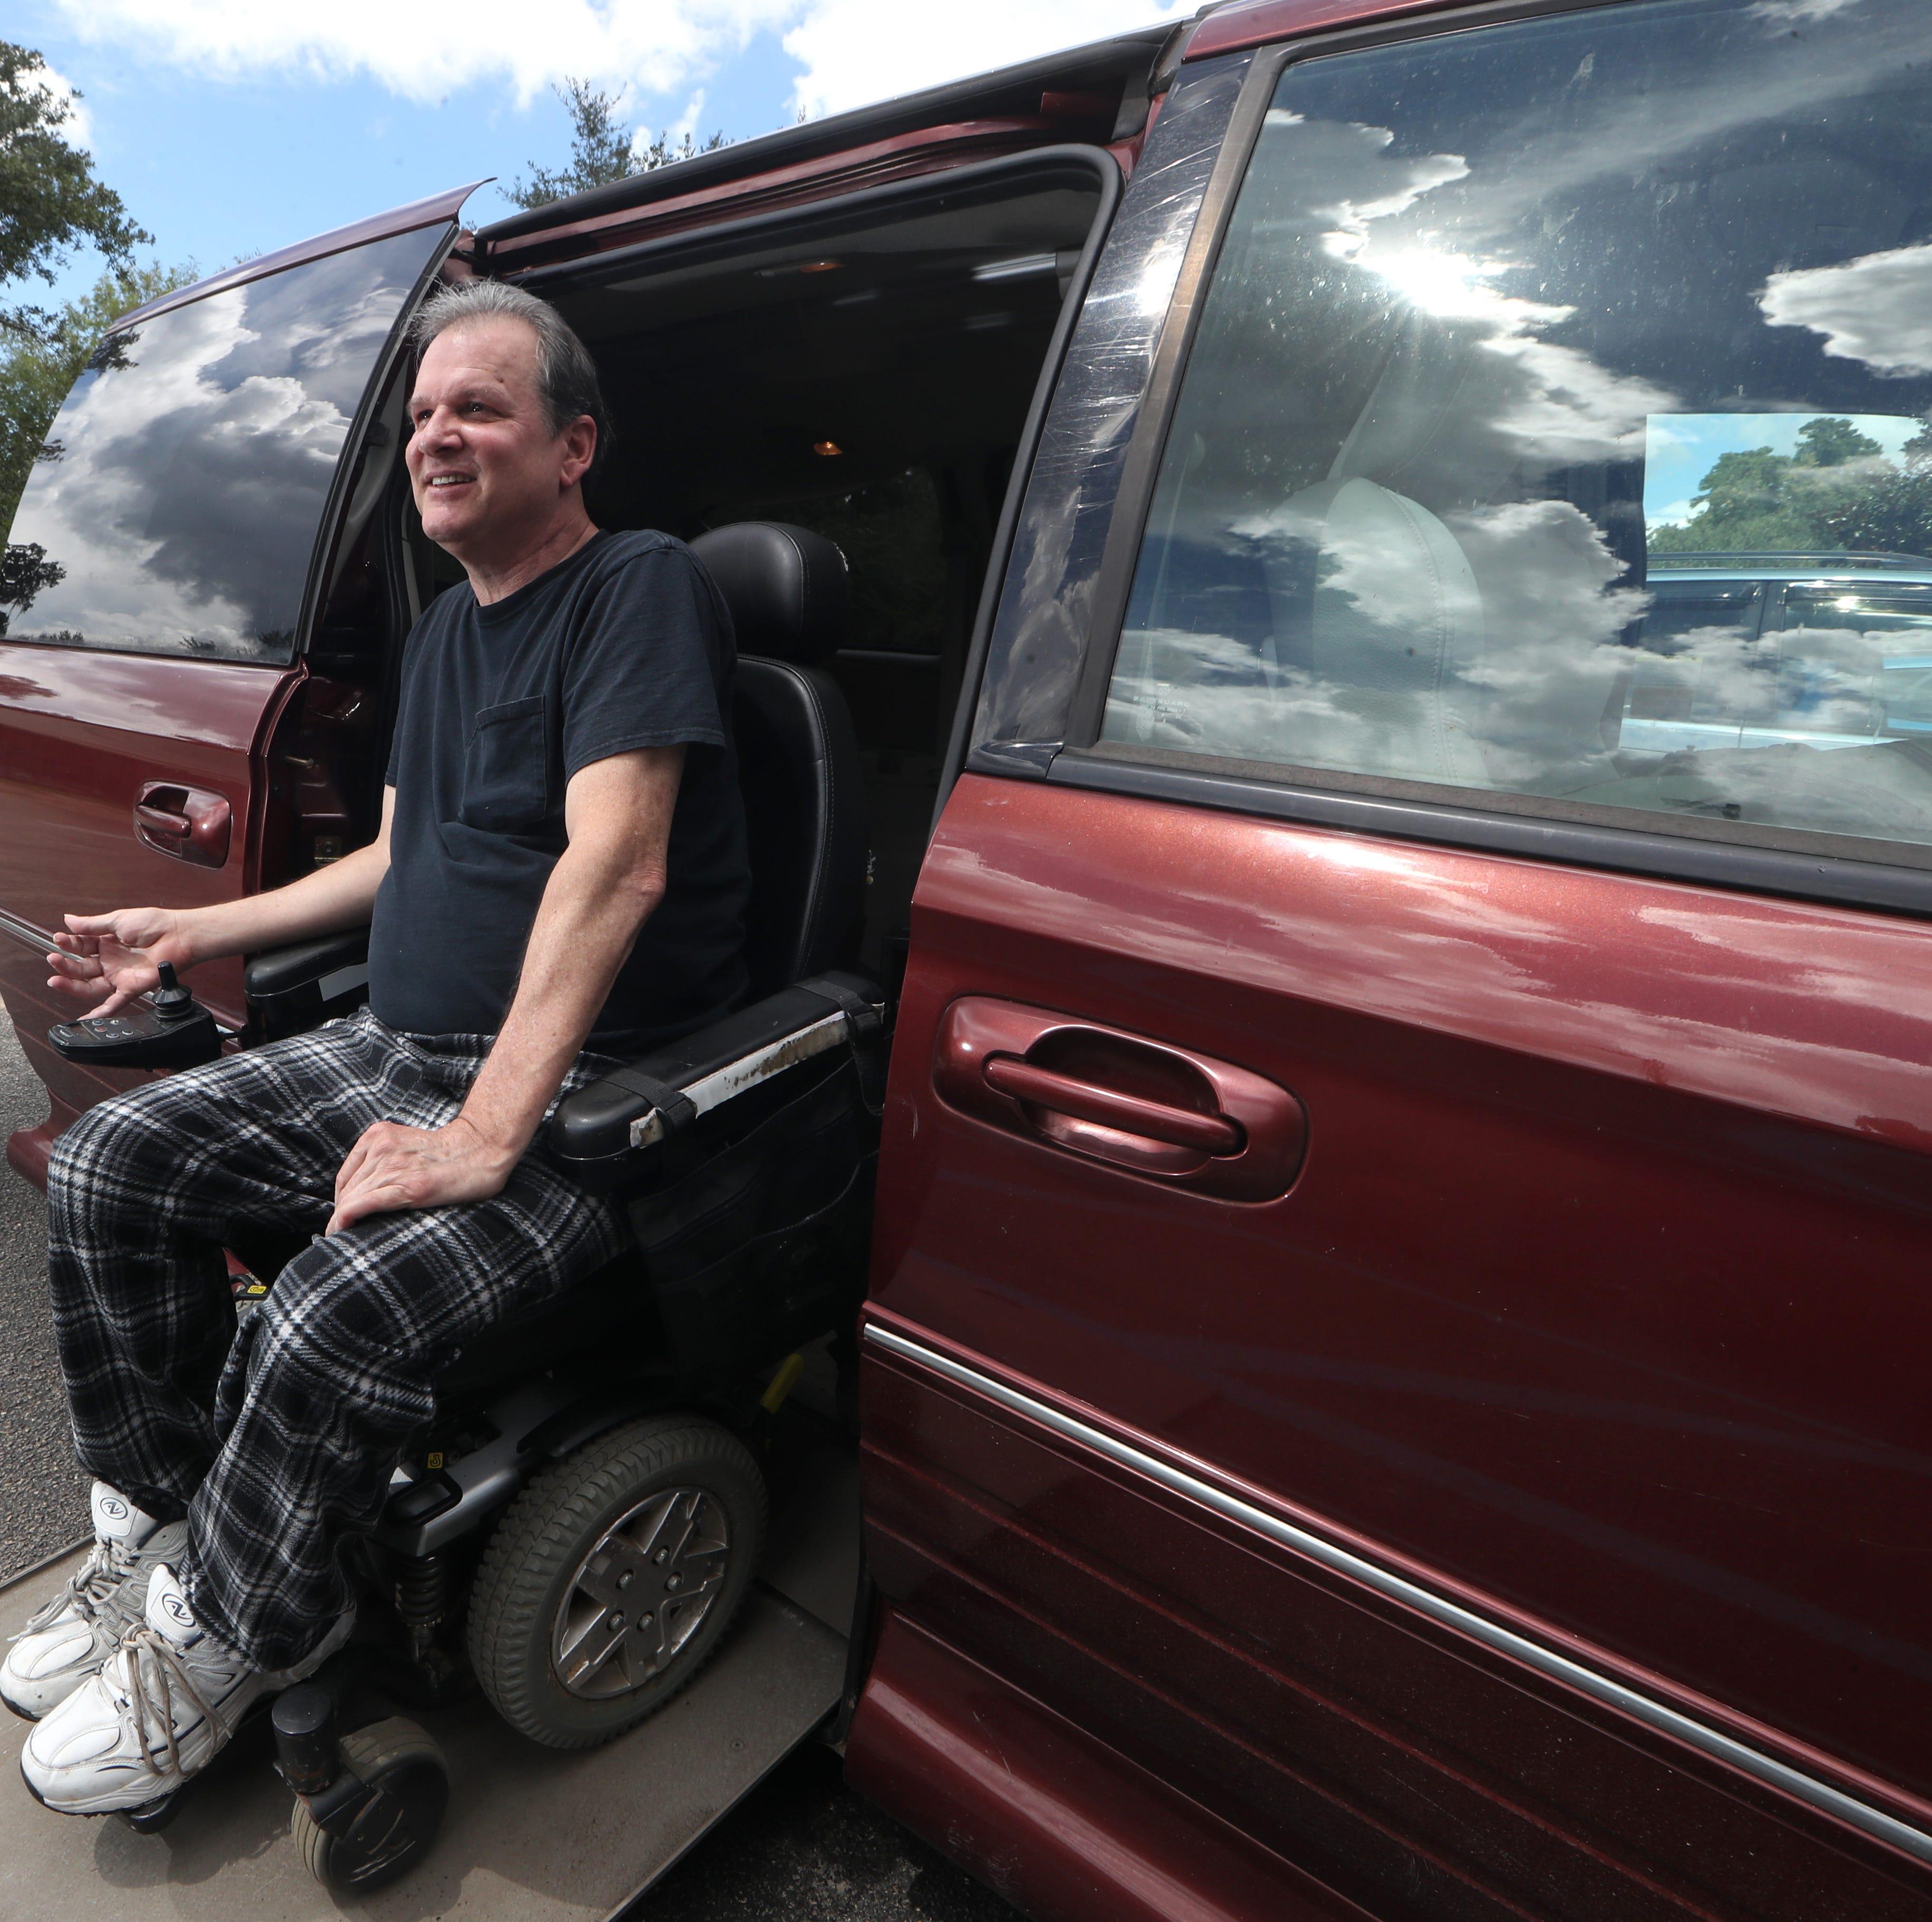 A friend in deed to a friend in need: Inherited van a lifesaver for quadriplegic